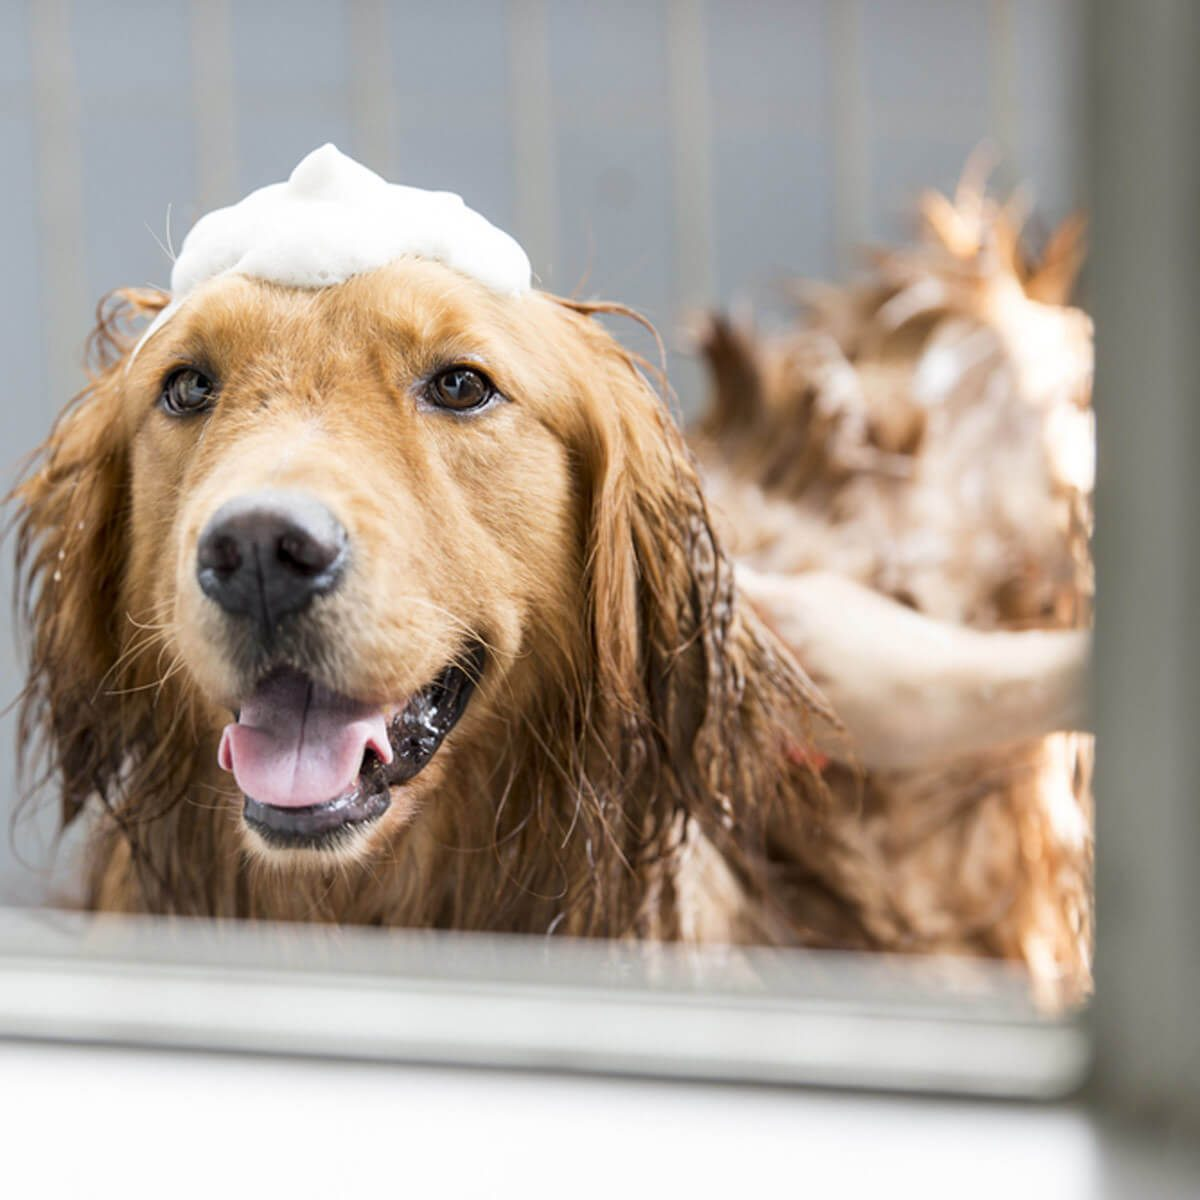 give your dog a bath life hacks